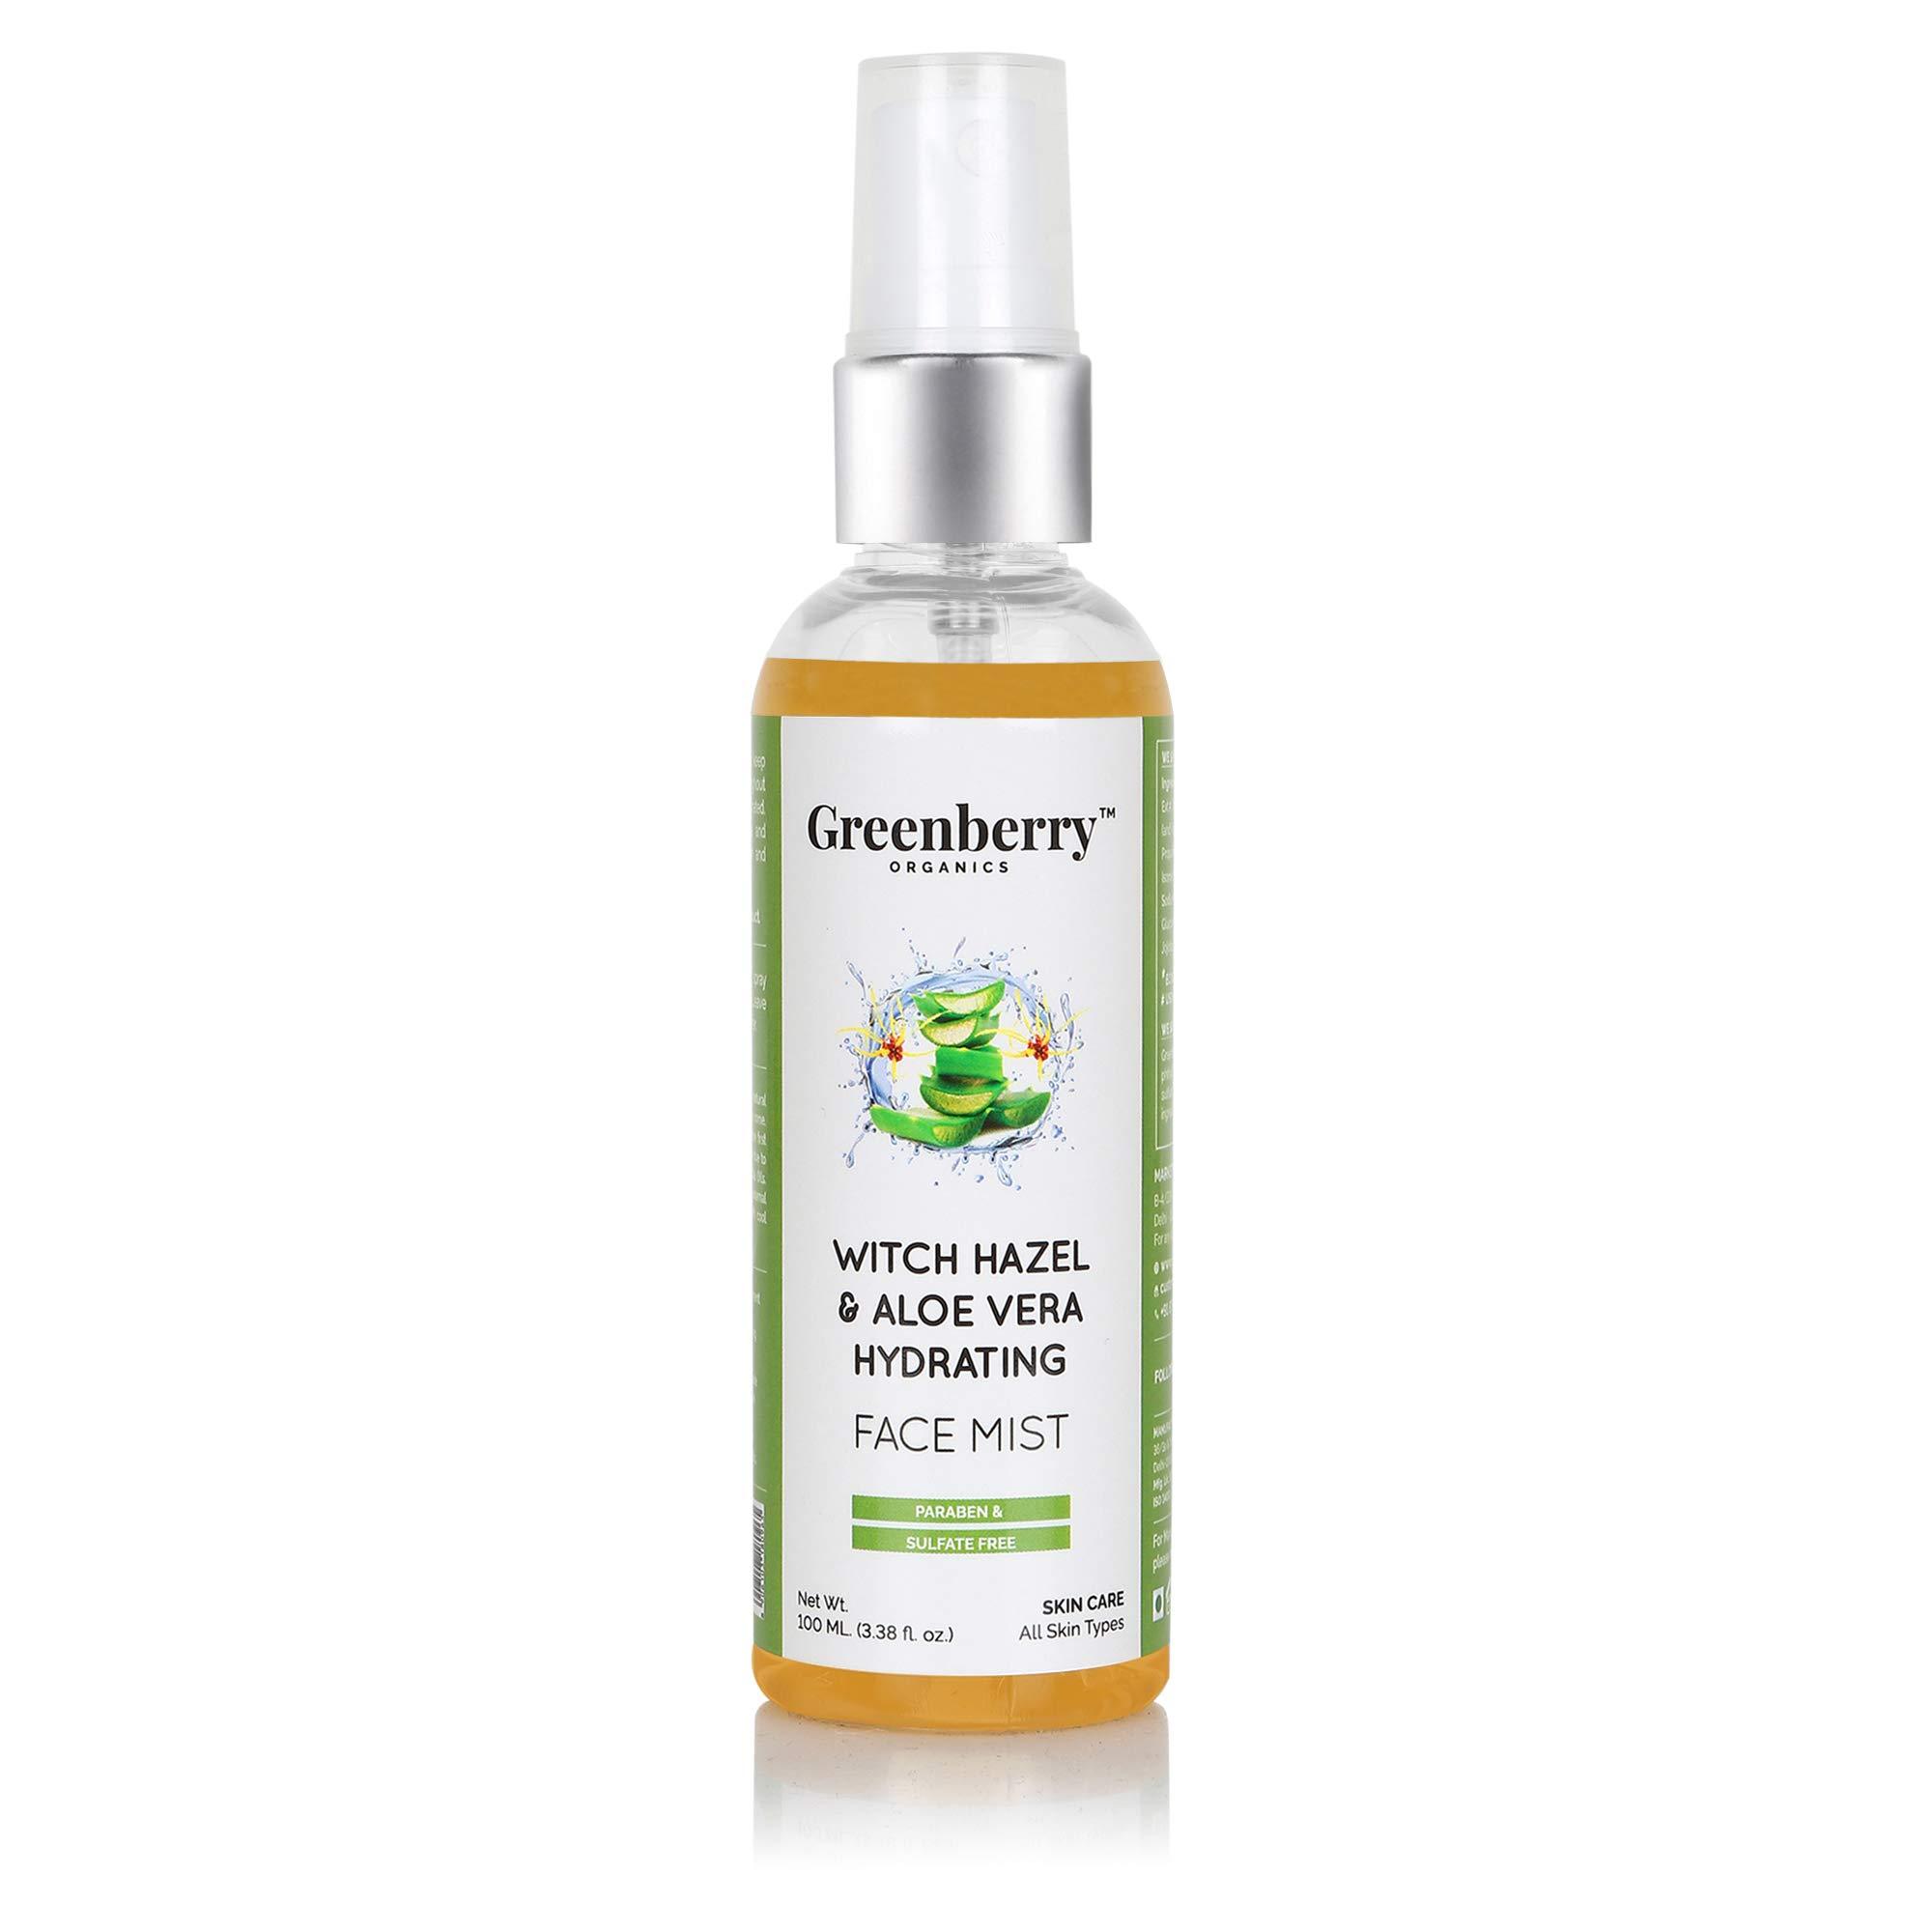 Greenberry Organics Witch Hazel & Aloe Vera Hydrating Face Mist for Men & Women, 100 ML product image